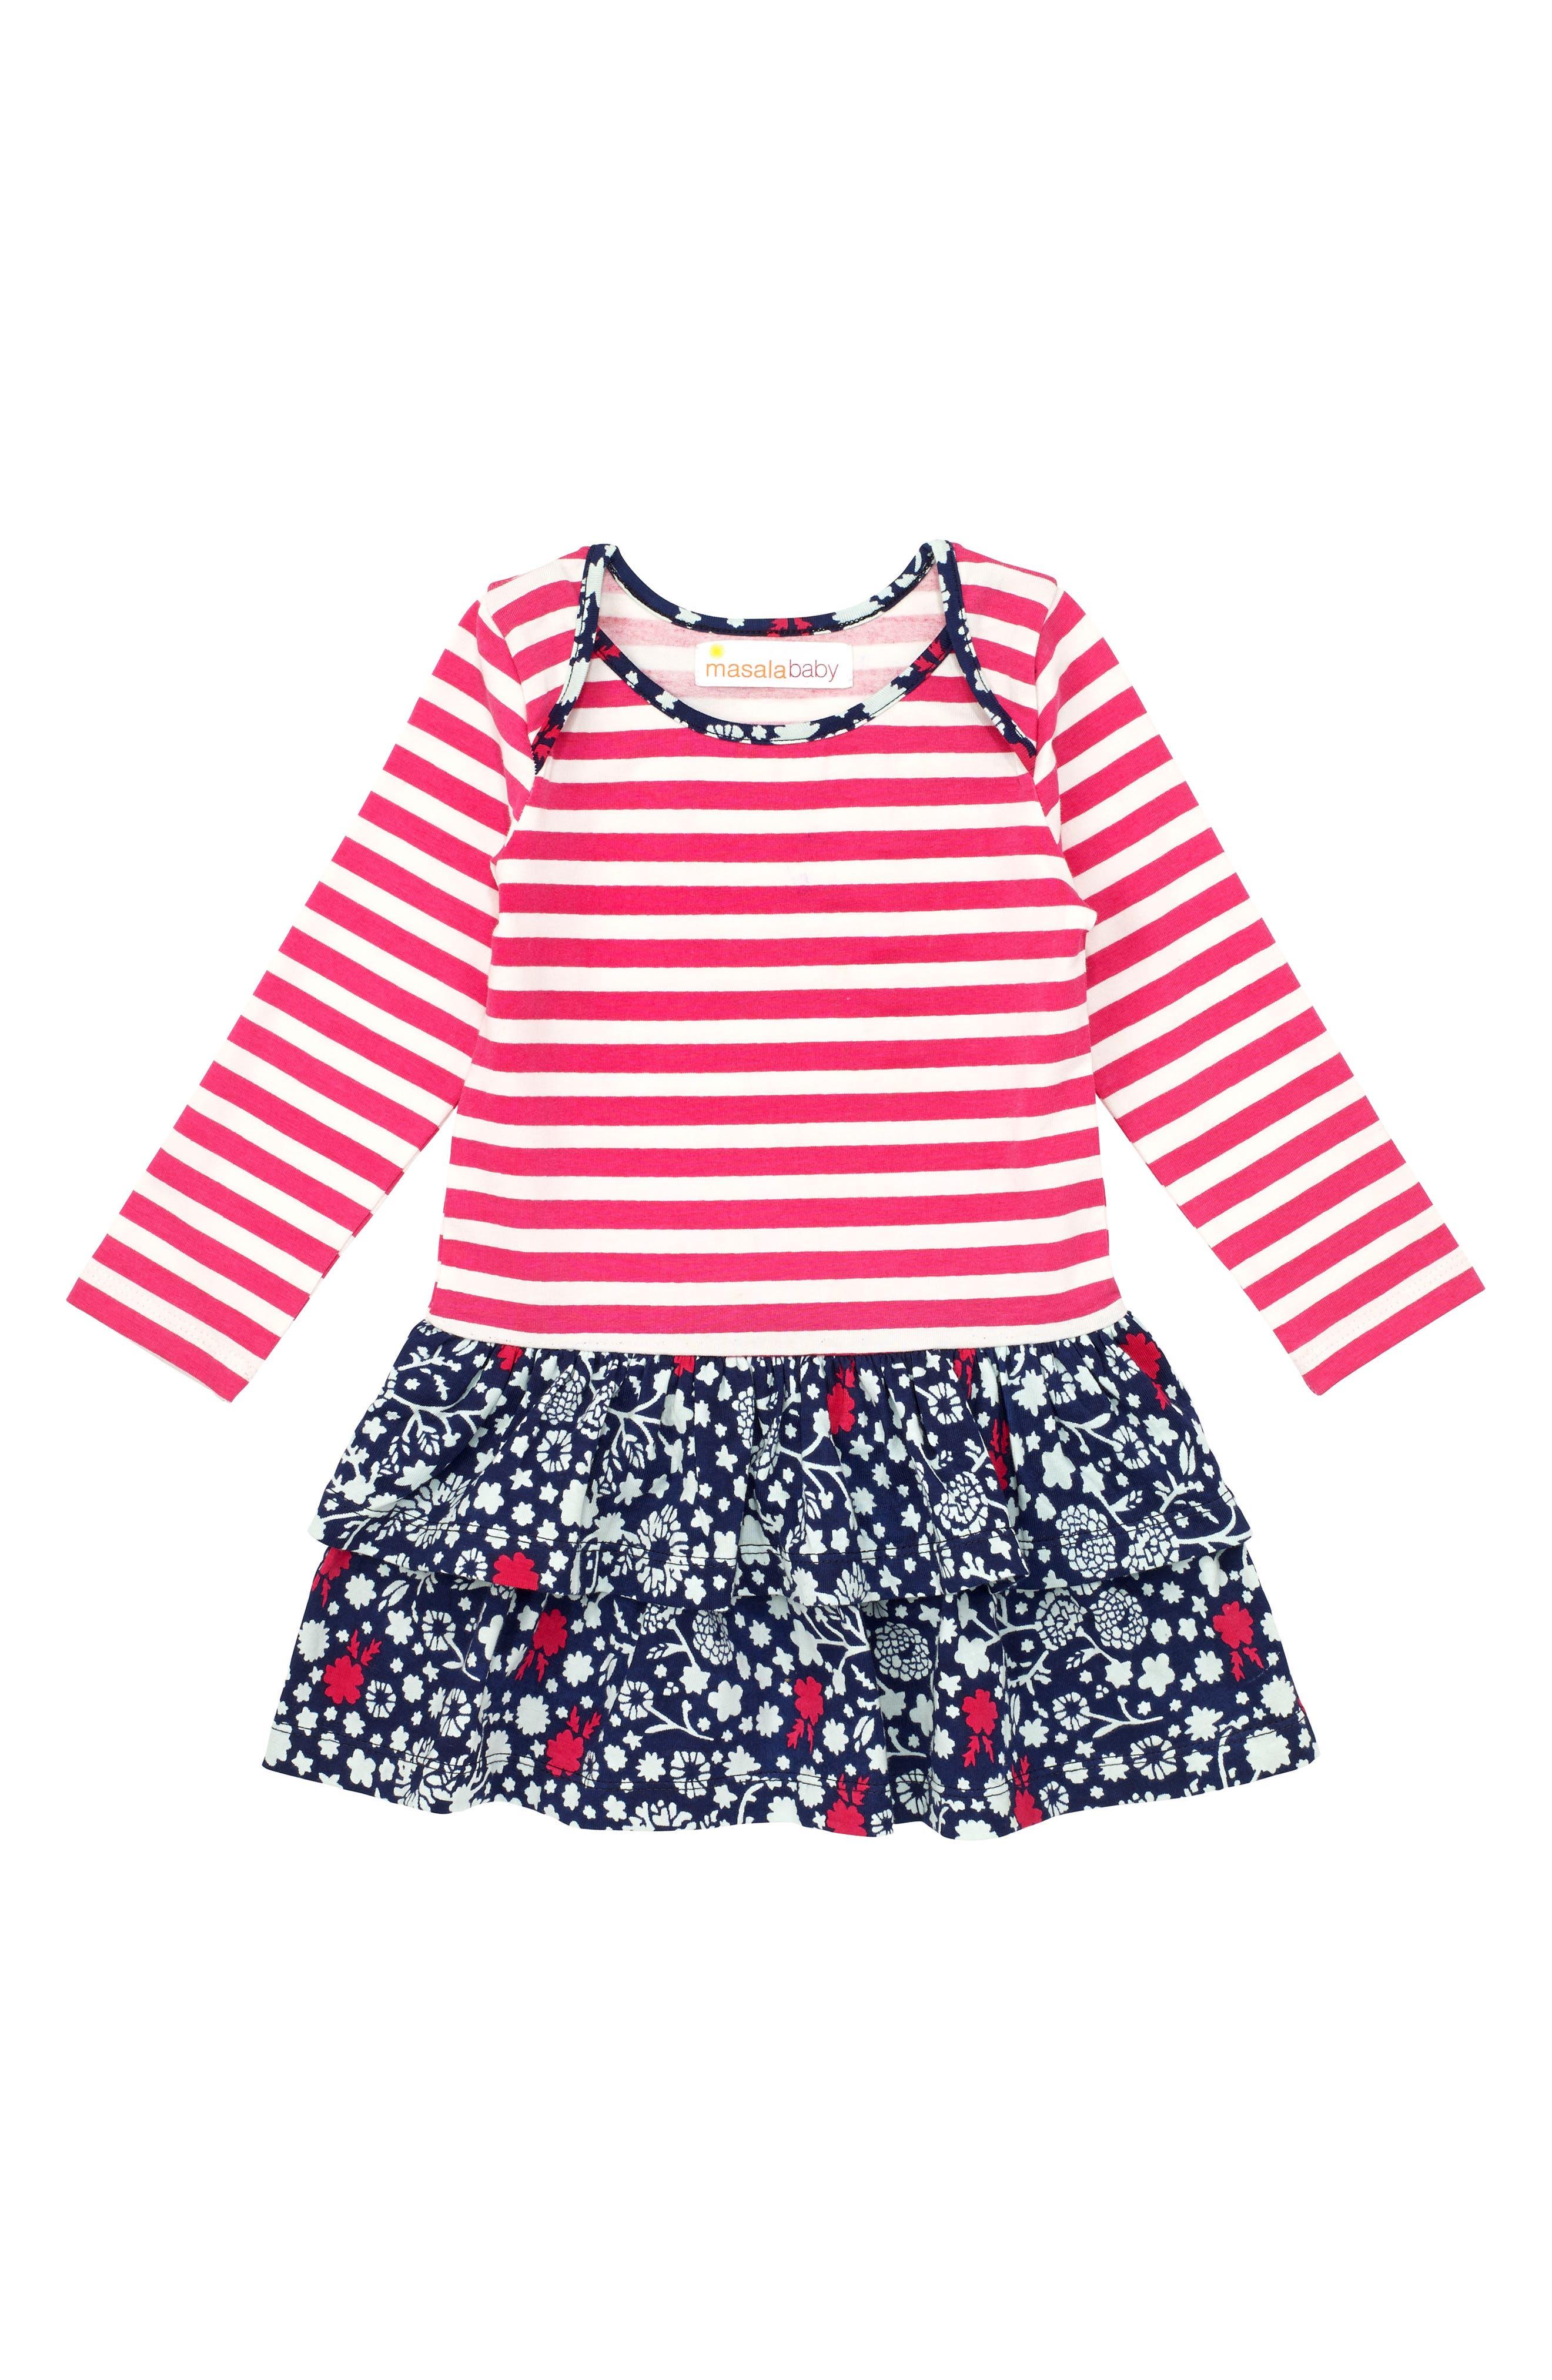 Alternate Image 1 Selected - Masala Baby Belle Organic Cotton Dress (Baby Girls)